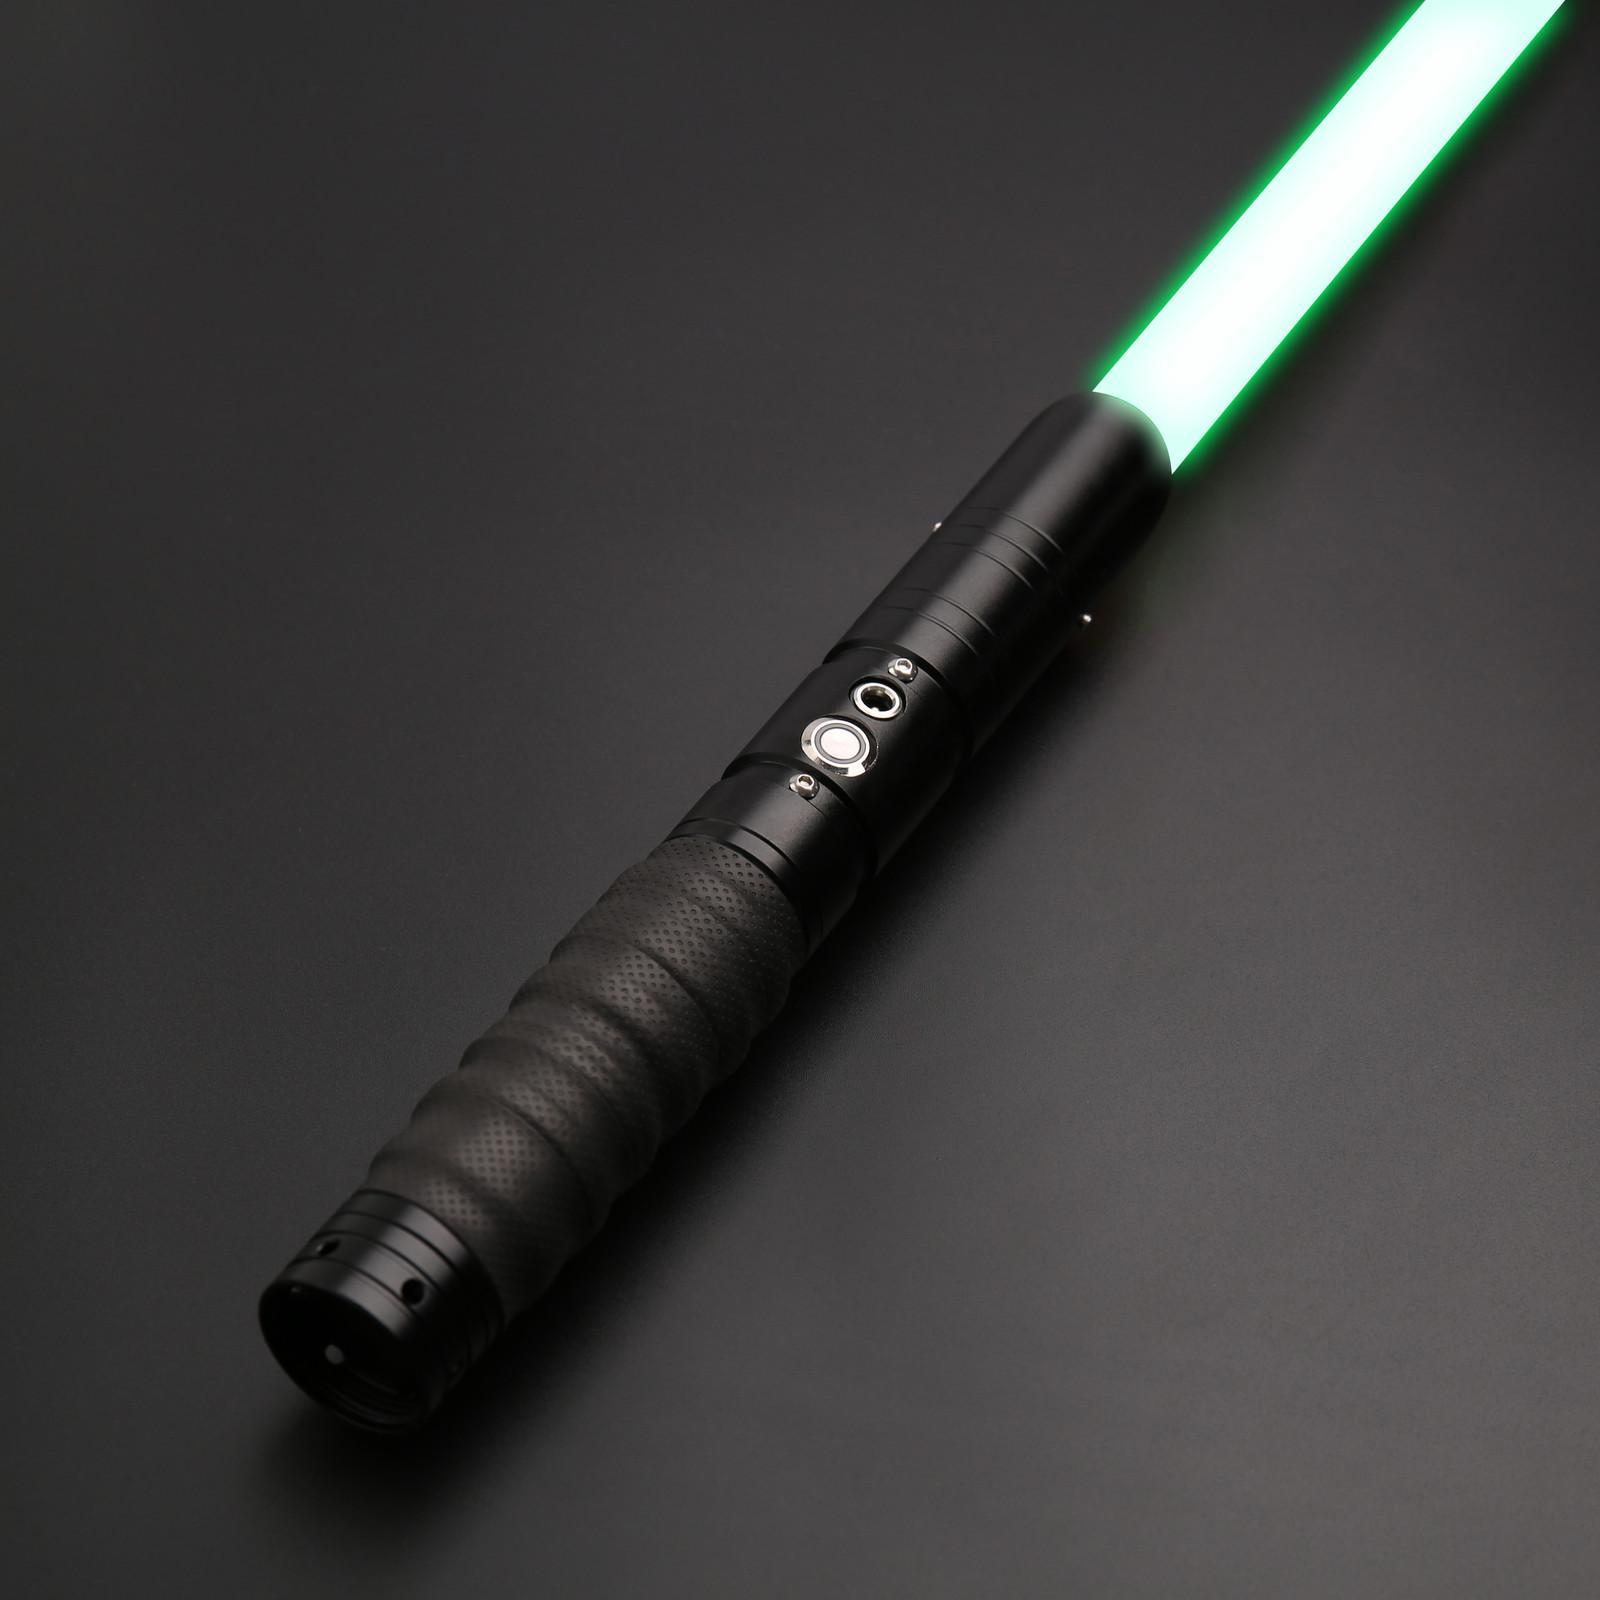 TXQSaber Sıcak SkyWalker LightSaber Luke Metal Saber Lazer Force FX Ağır Dueling Yüksek Ses Yüksek Işık FOC-TS001SILVER Q0115